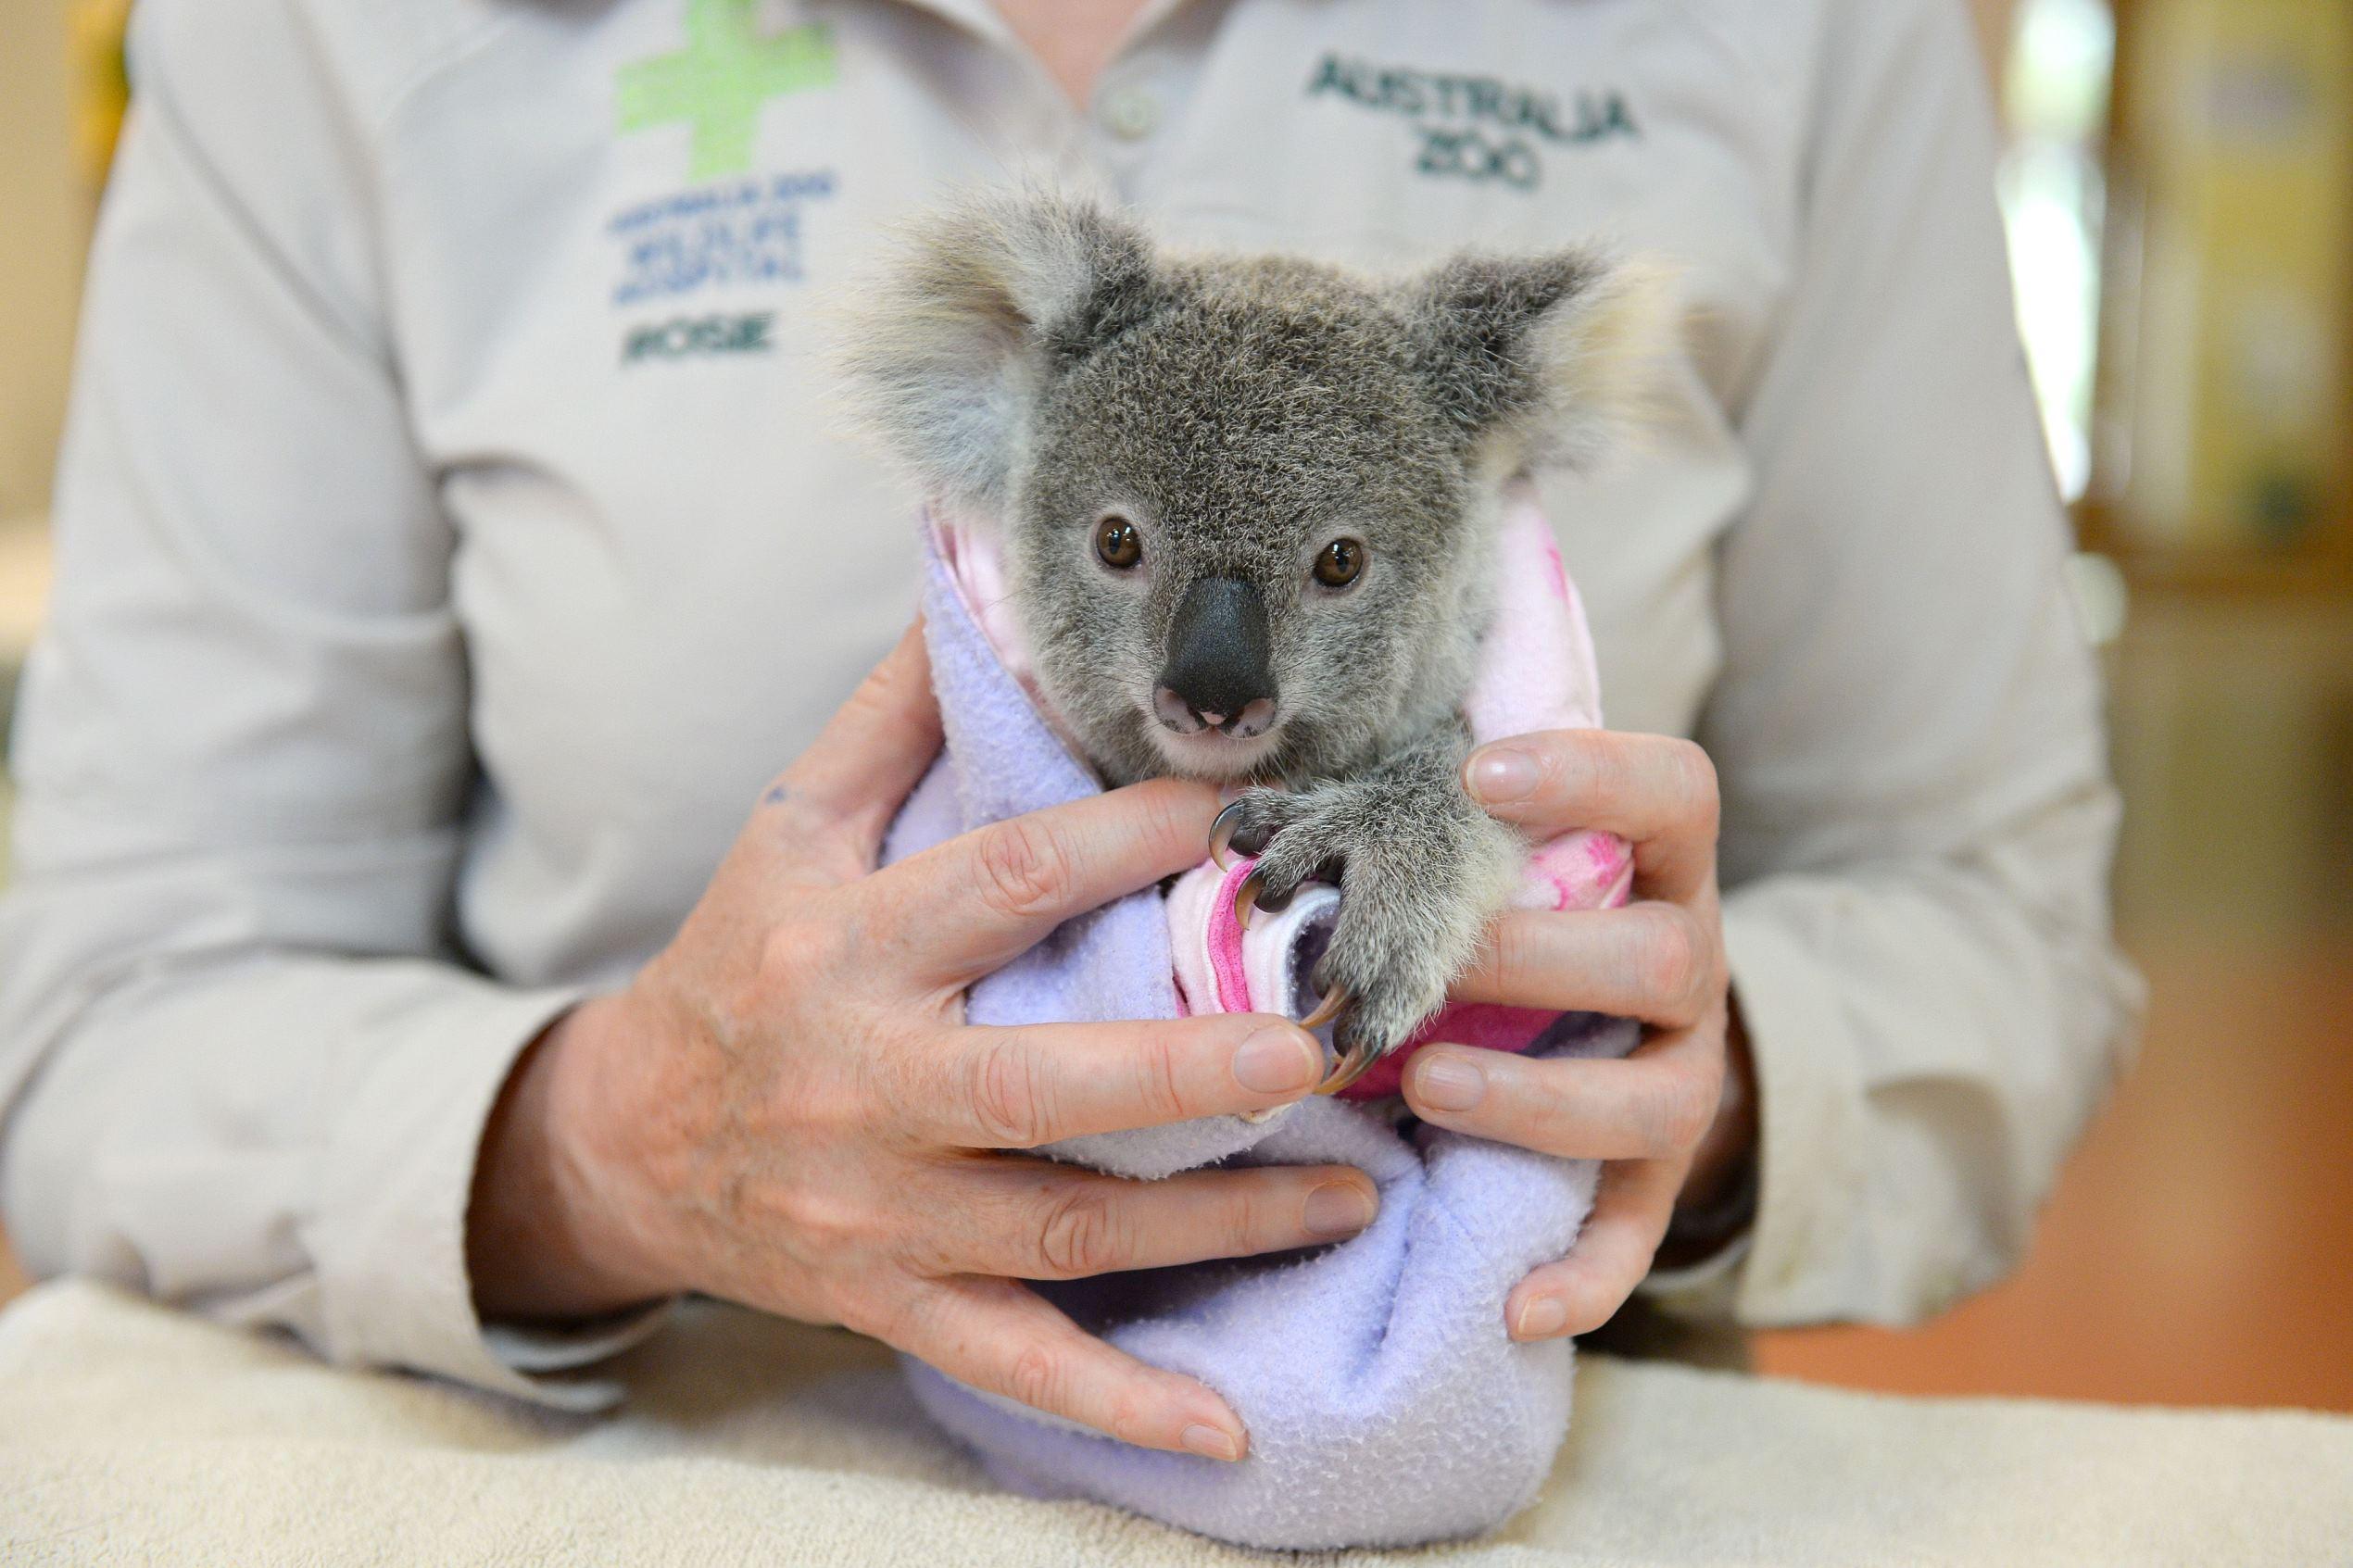 Слайд 2 из 67: Australia Zoo Wildlife Hospital prepares for yearly admission peak, Beerwah, Queensland, Australia - 19 Sep 2016 Shayne the koala joey and mother were hit by a car. The mother died